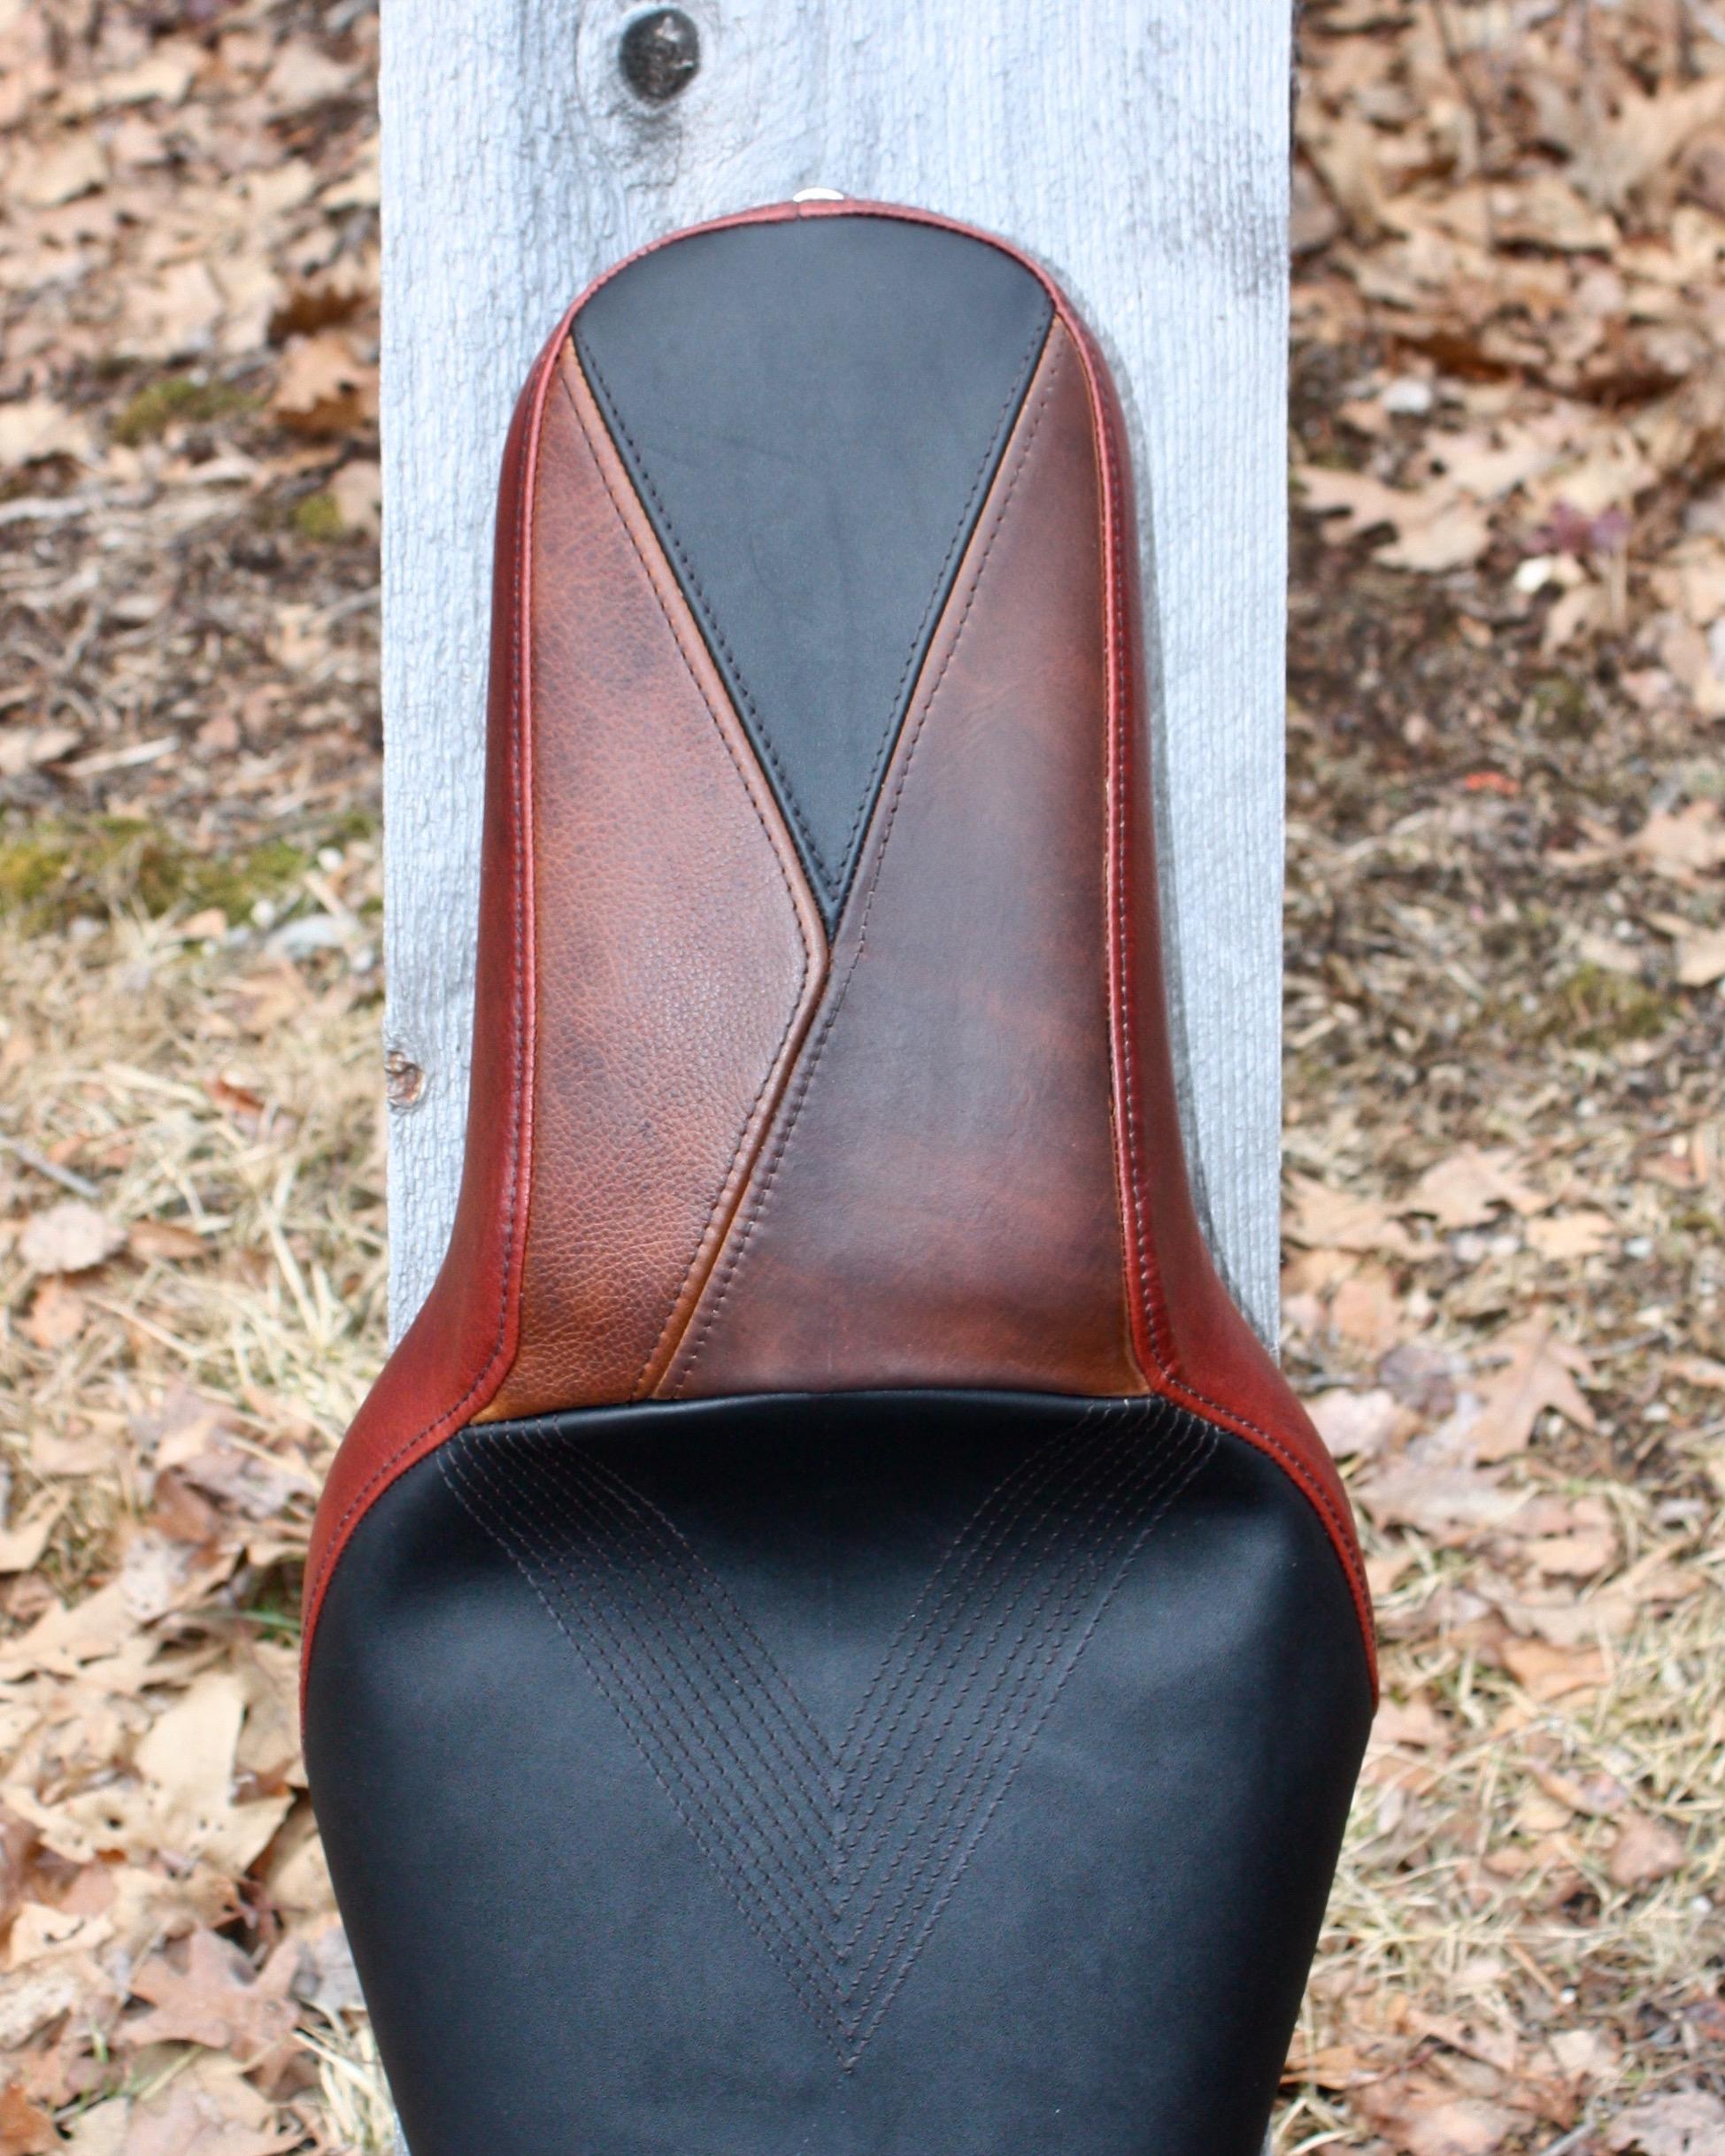 Sportster -- Maven Seats